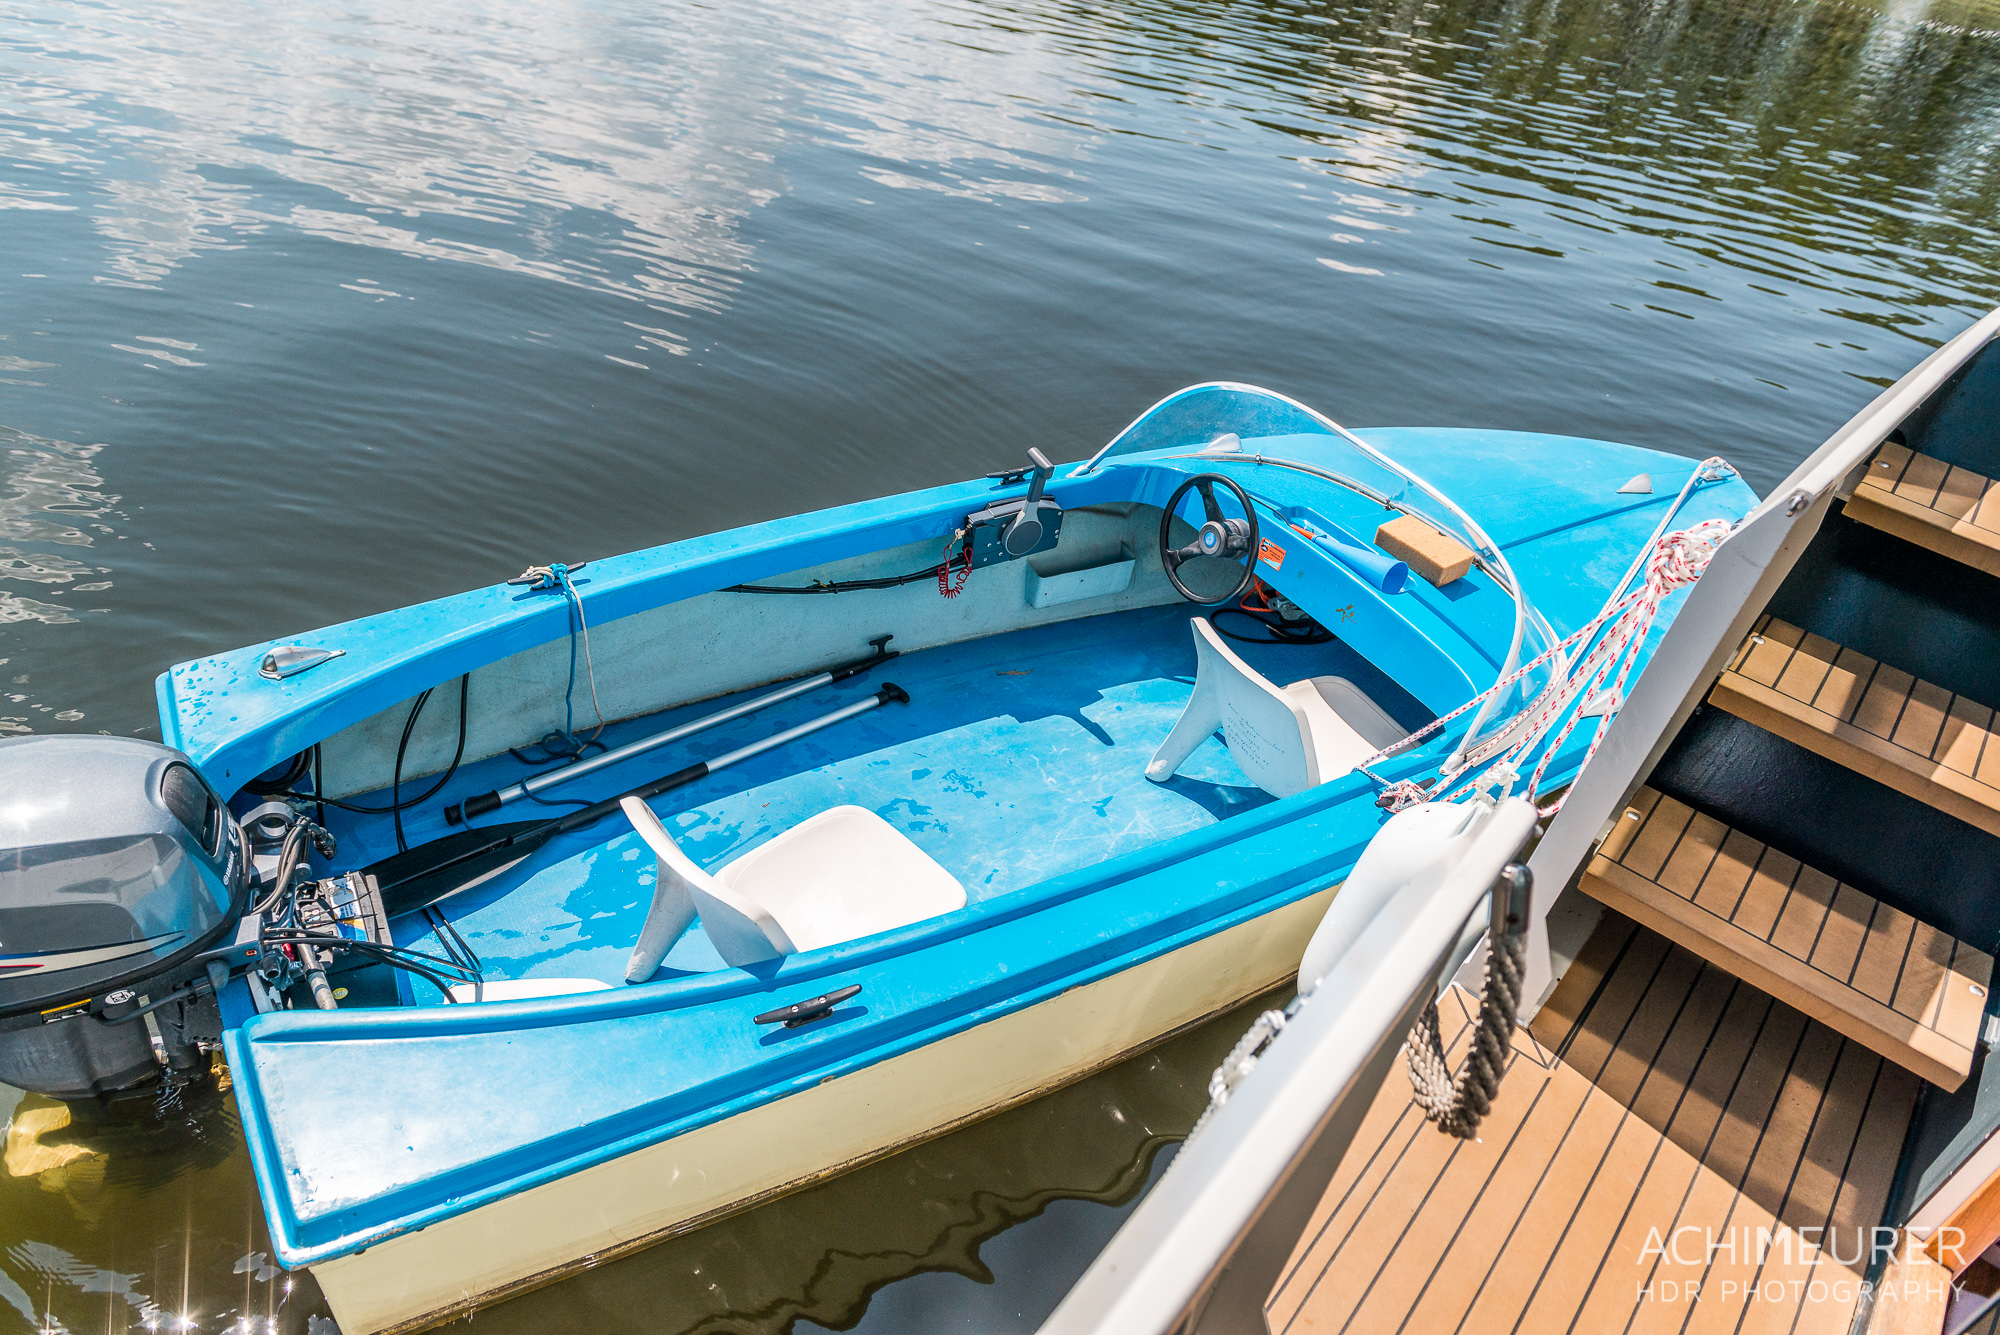 Hausboot-Kuhnle-Mueritz-Mecklenburg-Vorpommern-See_3101